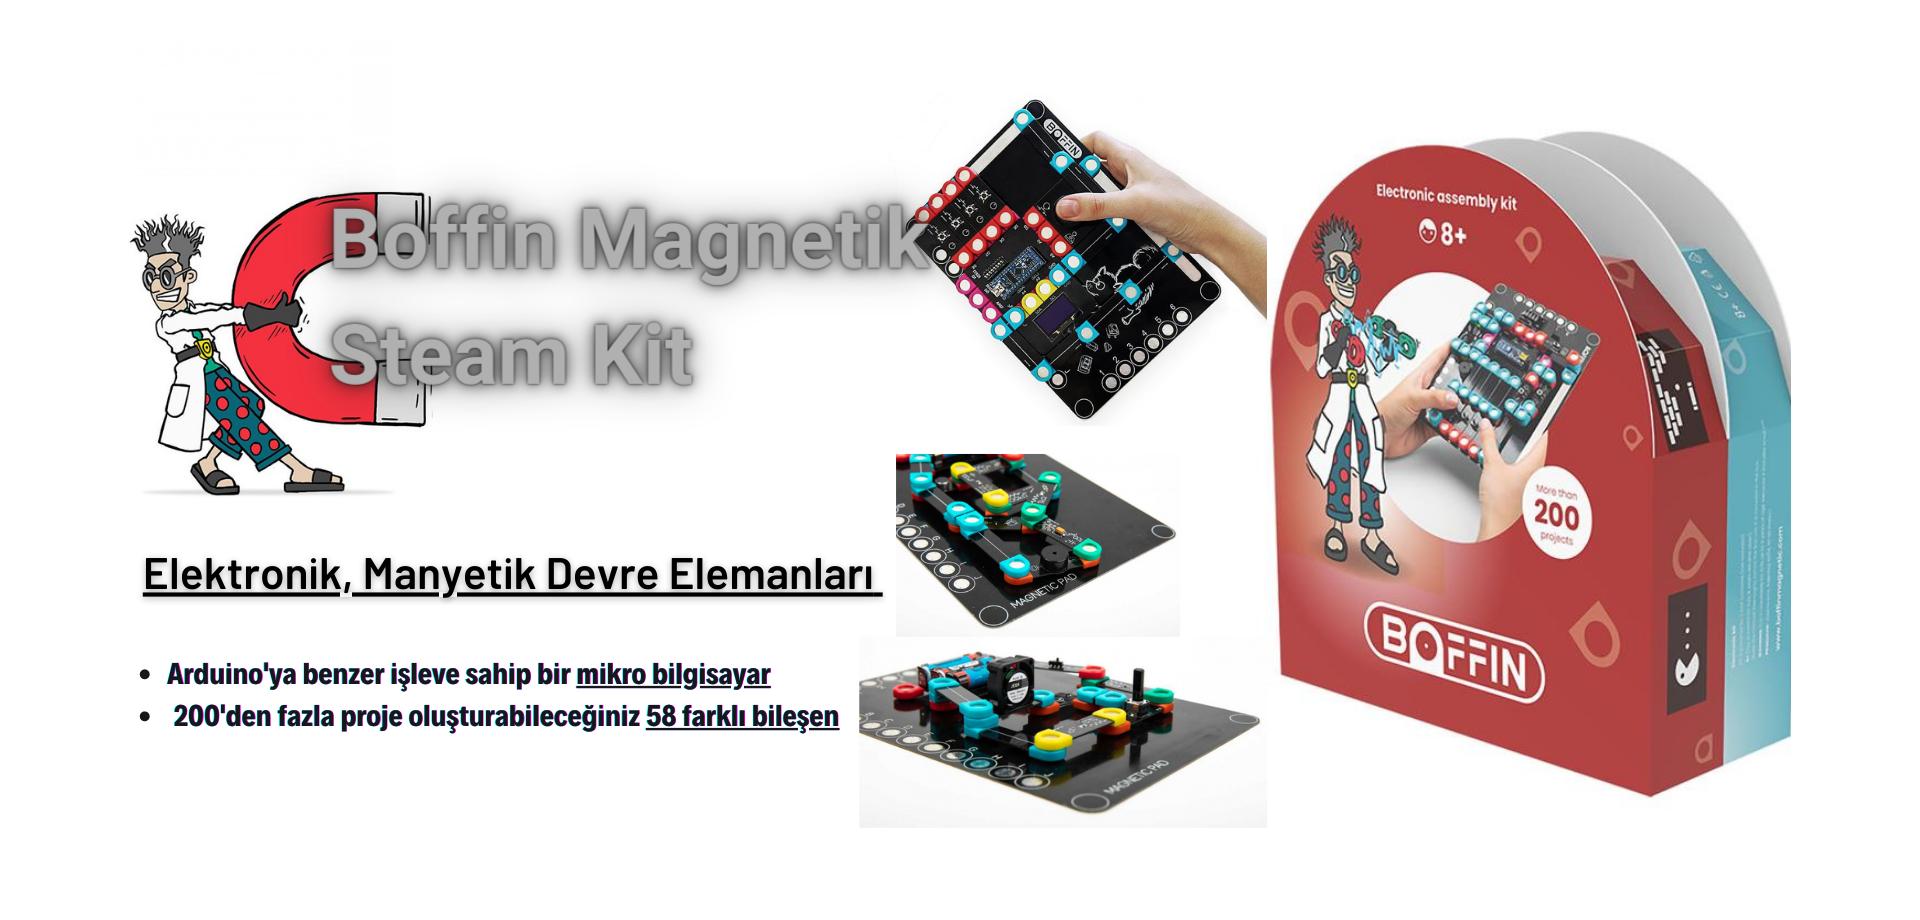 Boffin Magnetik Steam Kit